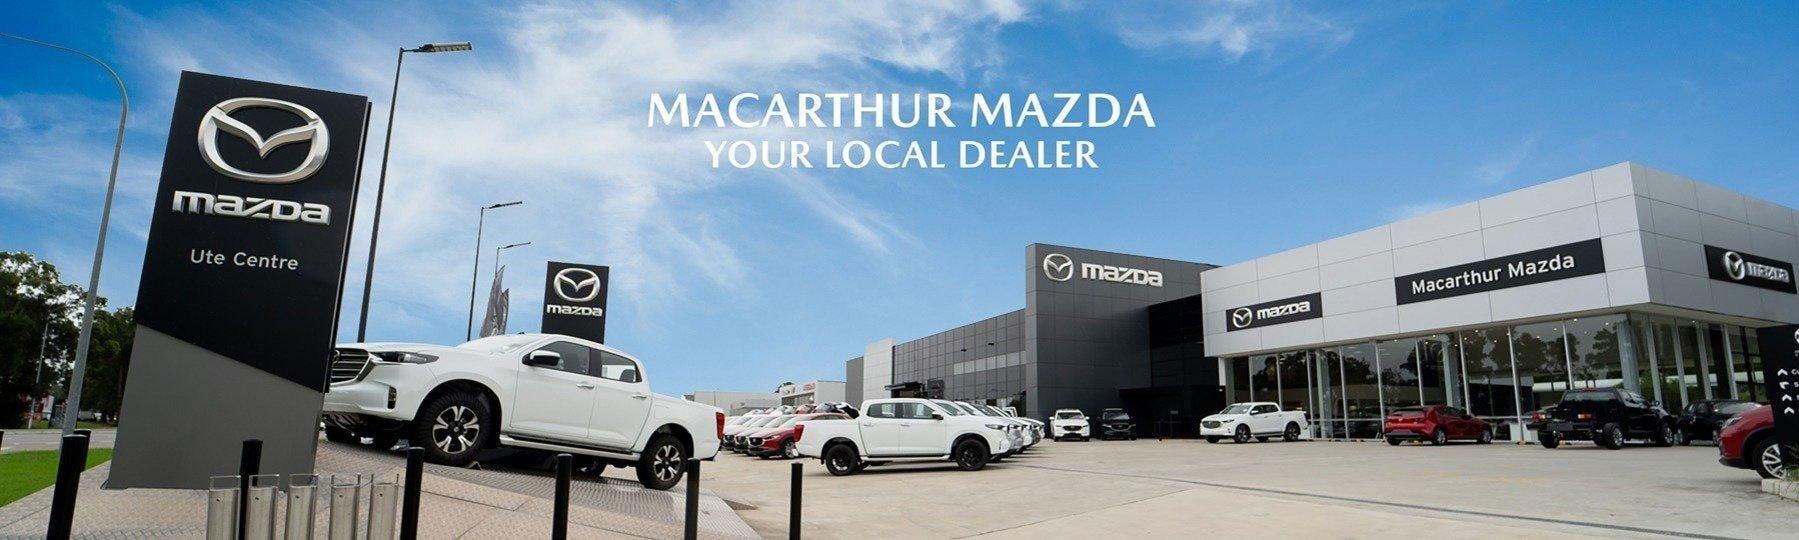 Macarthur Mazda